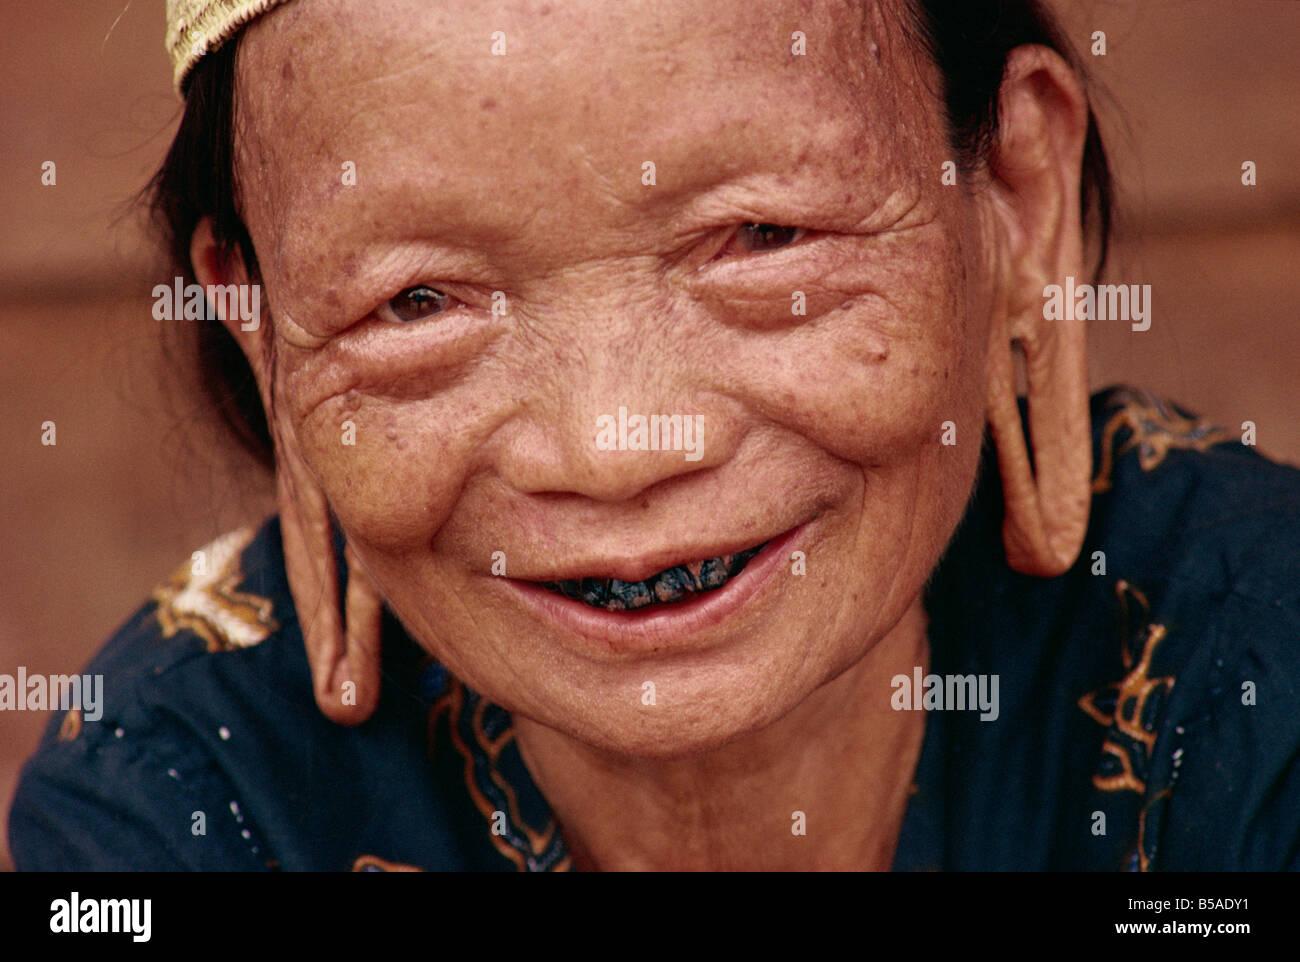 Old Dyak woman, Kalimantan, Indonesia, Southeast Asia - Stock Image